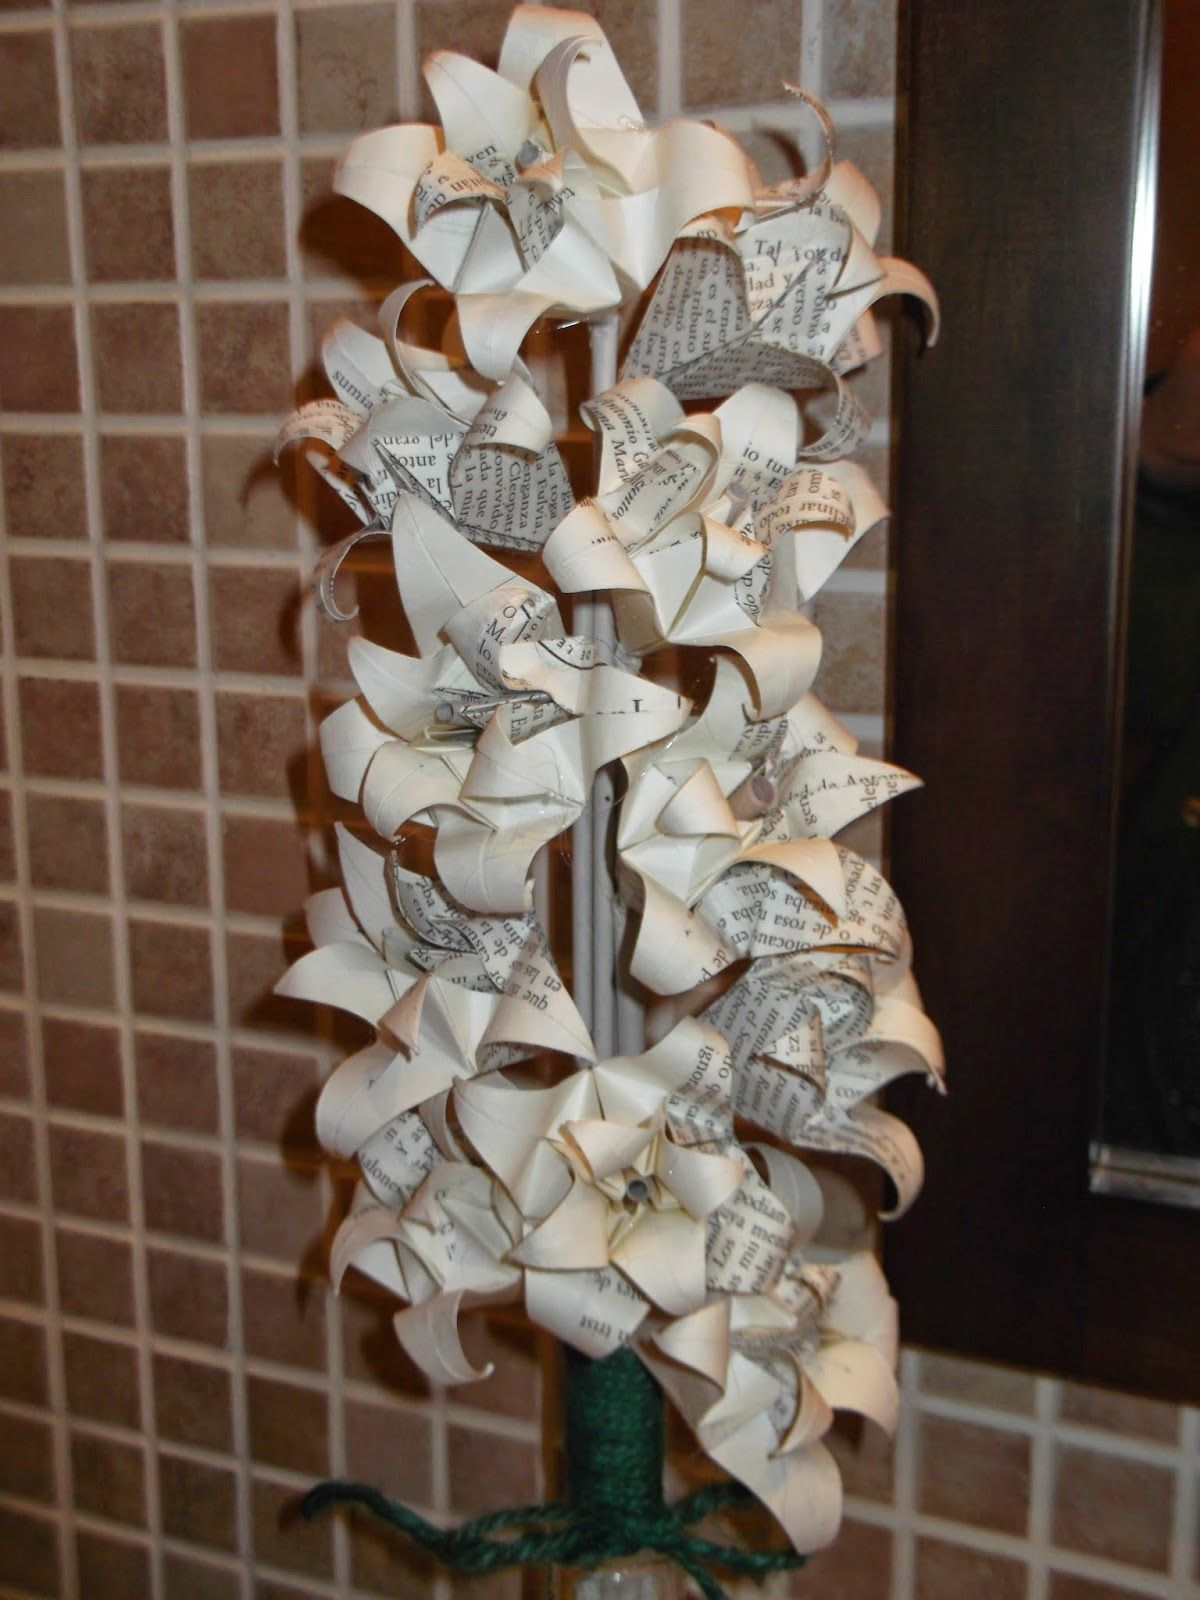 Manualidades y mas cosas manualidades con papel papel de periodico pepa pinterest - Manualidades con papel craft ...